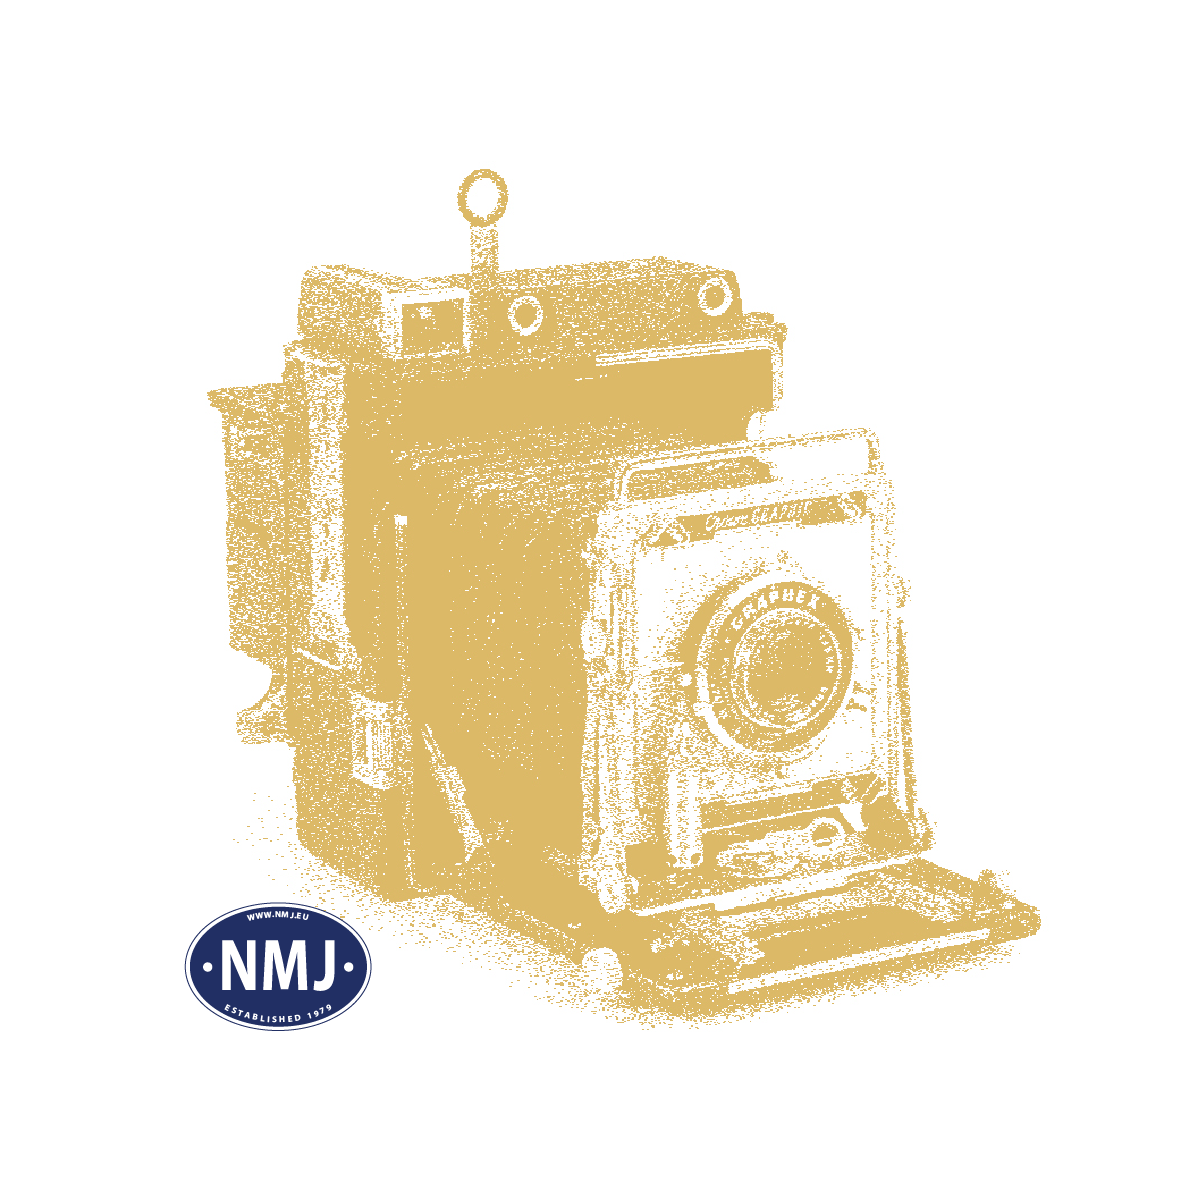 NMJT131.303 - NMJ Topline NSB B3-2 Type 3 25521, Nydesign